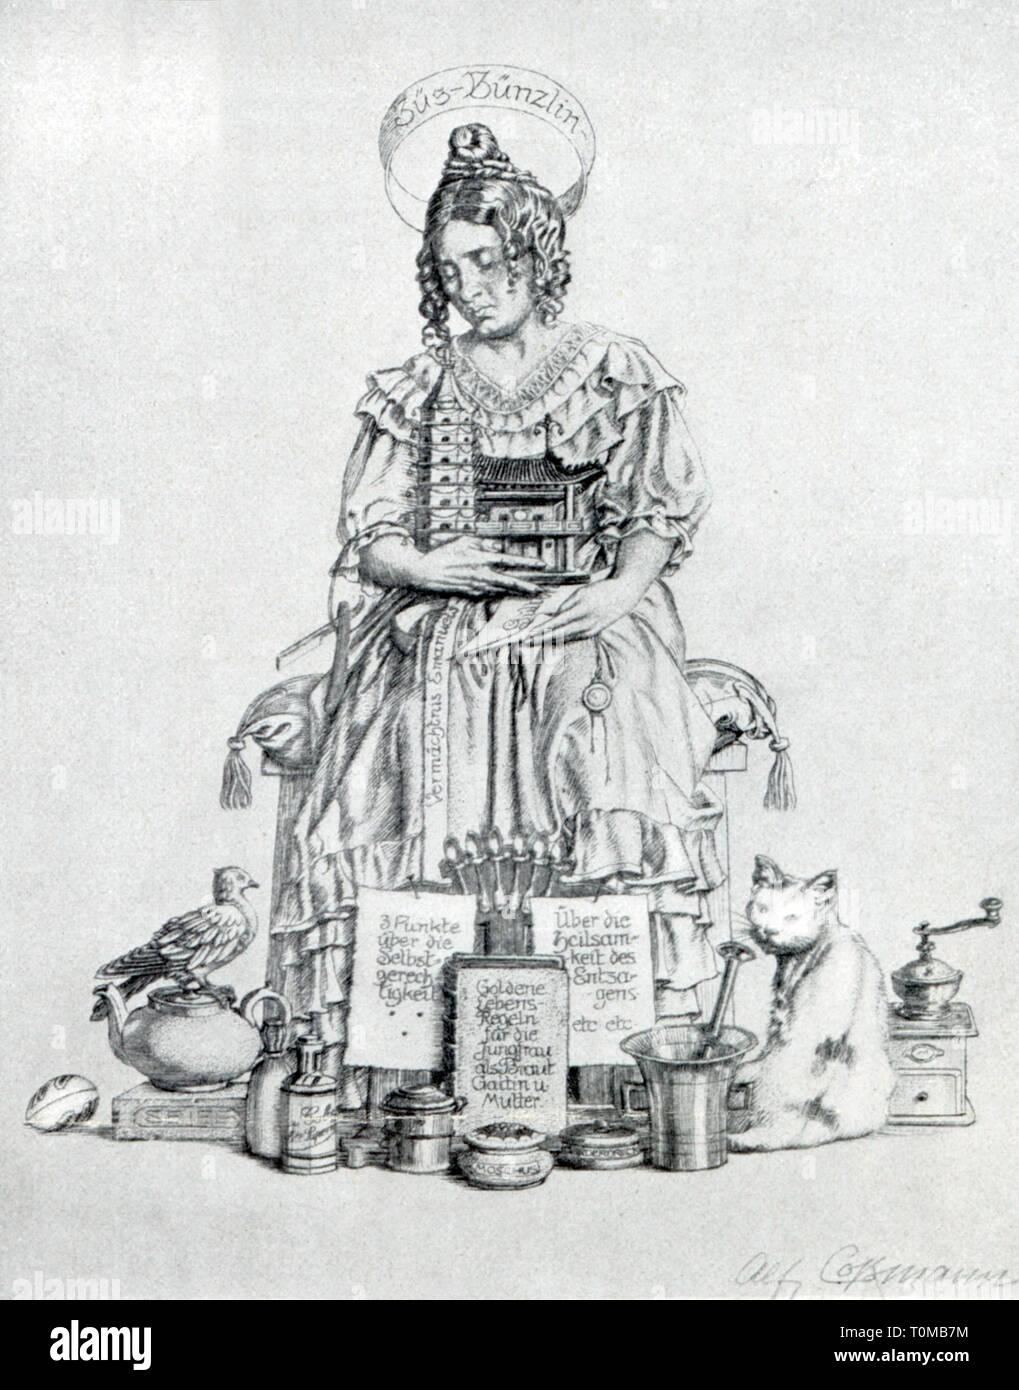 "Letteratura, illustrazioni, 'Jungfer Züs-Bünzlin', di attacco da Alfred Cossmann (1870 - 1951), fuori: Gottfried Keller (1857 - 1890), 'Die drei gerechten Kammacher"", Vienna, 1915, Additional-Rights-Clearance-Info-Not-Available Immagini Stock"